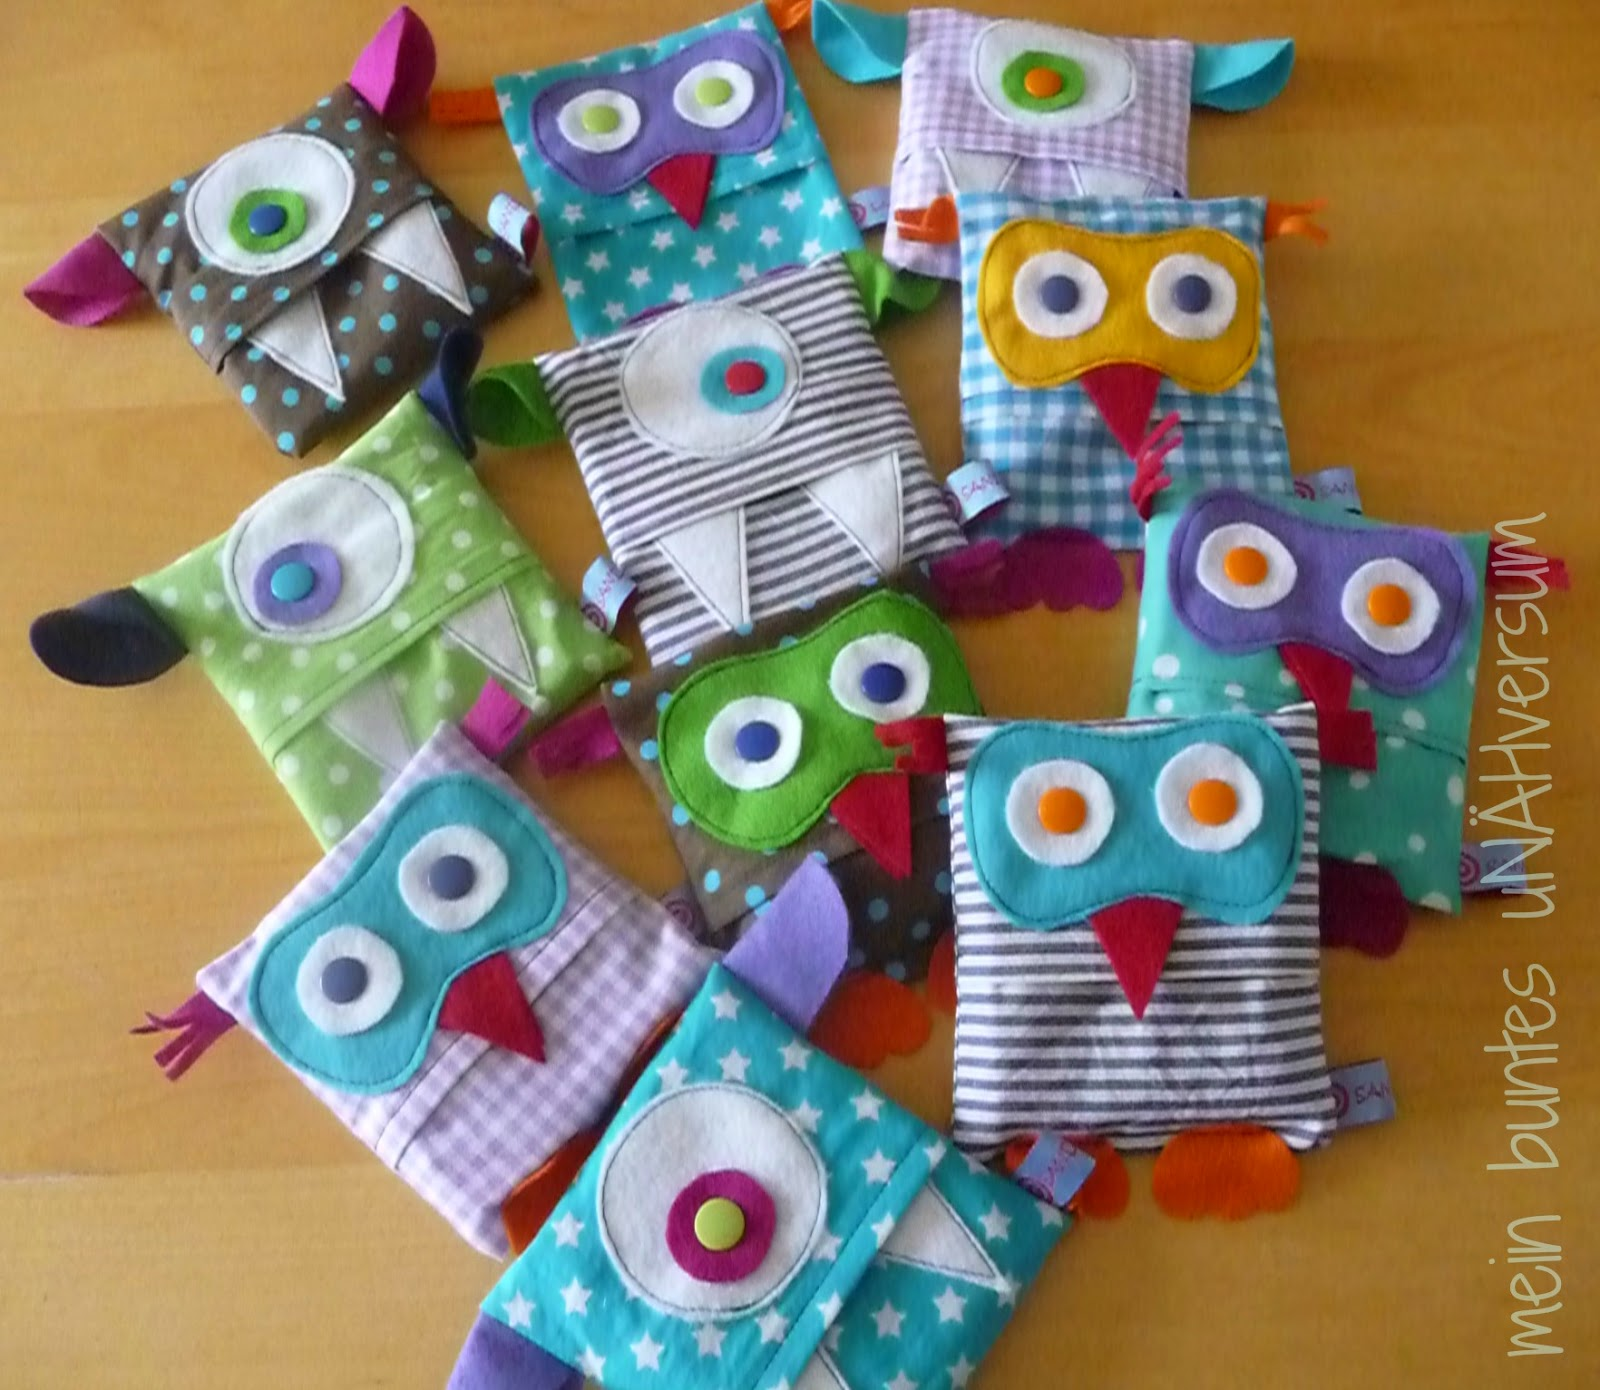 Kindergarten geburtstagsgeschenk basteln my blog for Abschiedsgeschenk ideen